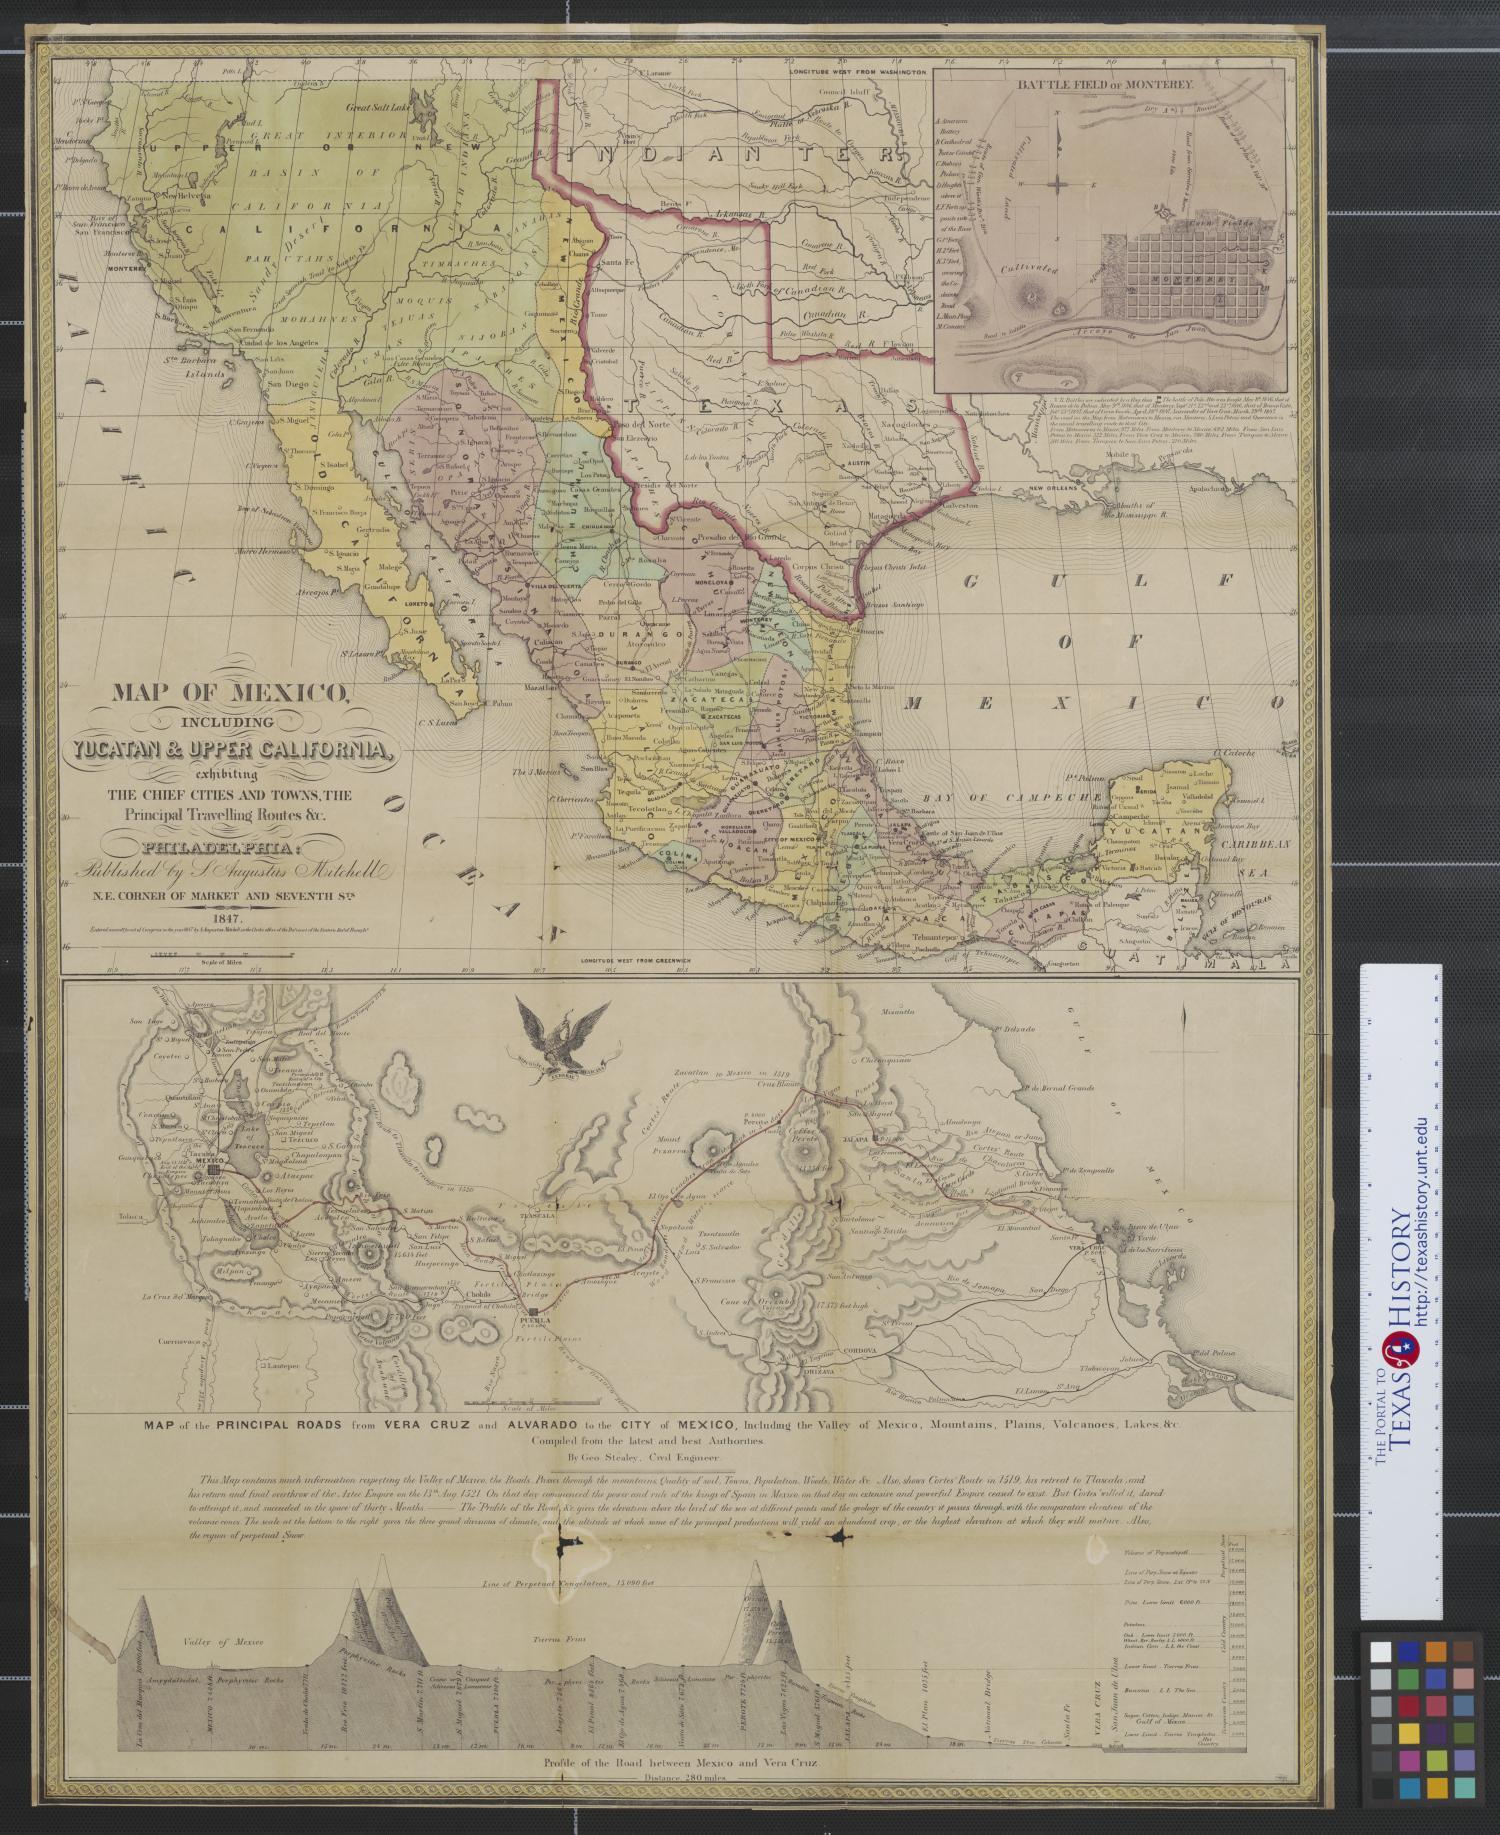 19 best MONTERREY ANTIGUO images on Pinterest | History ... |Old Monterrey Mexico Map